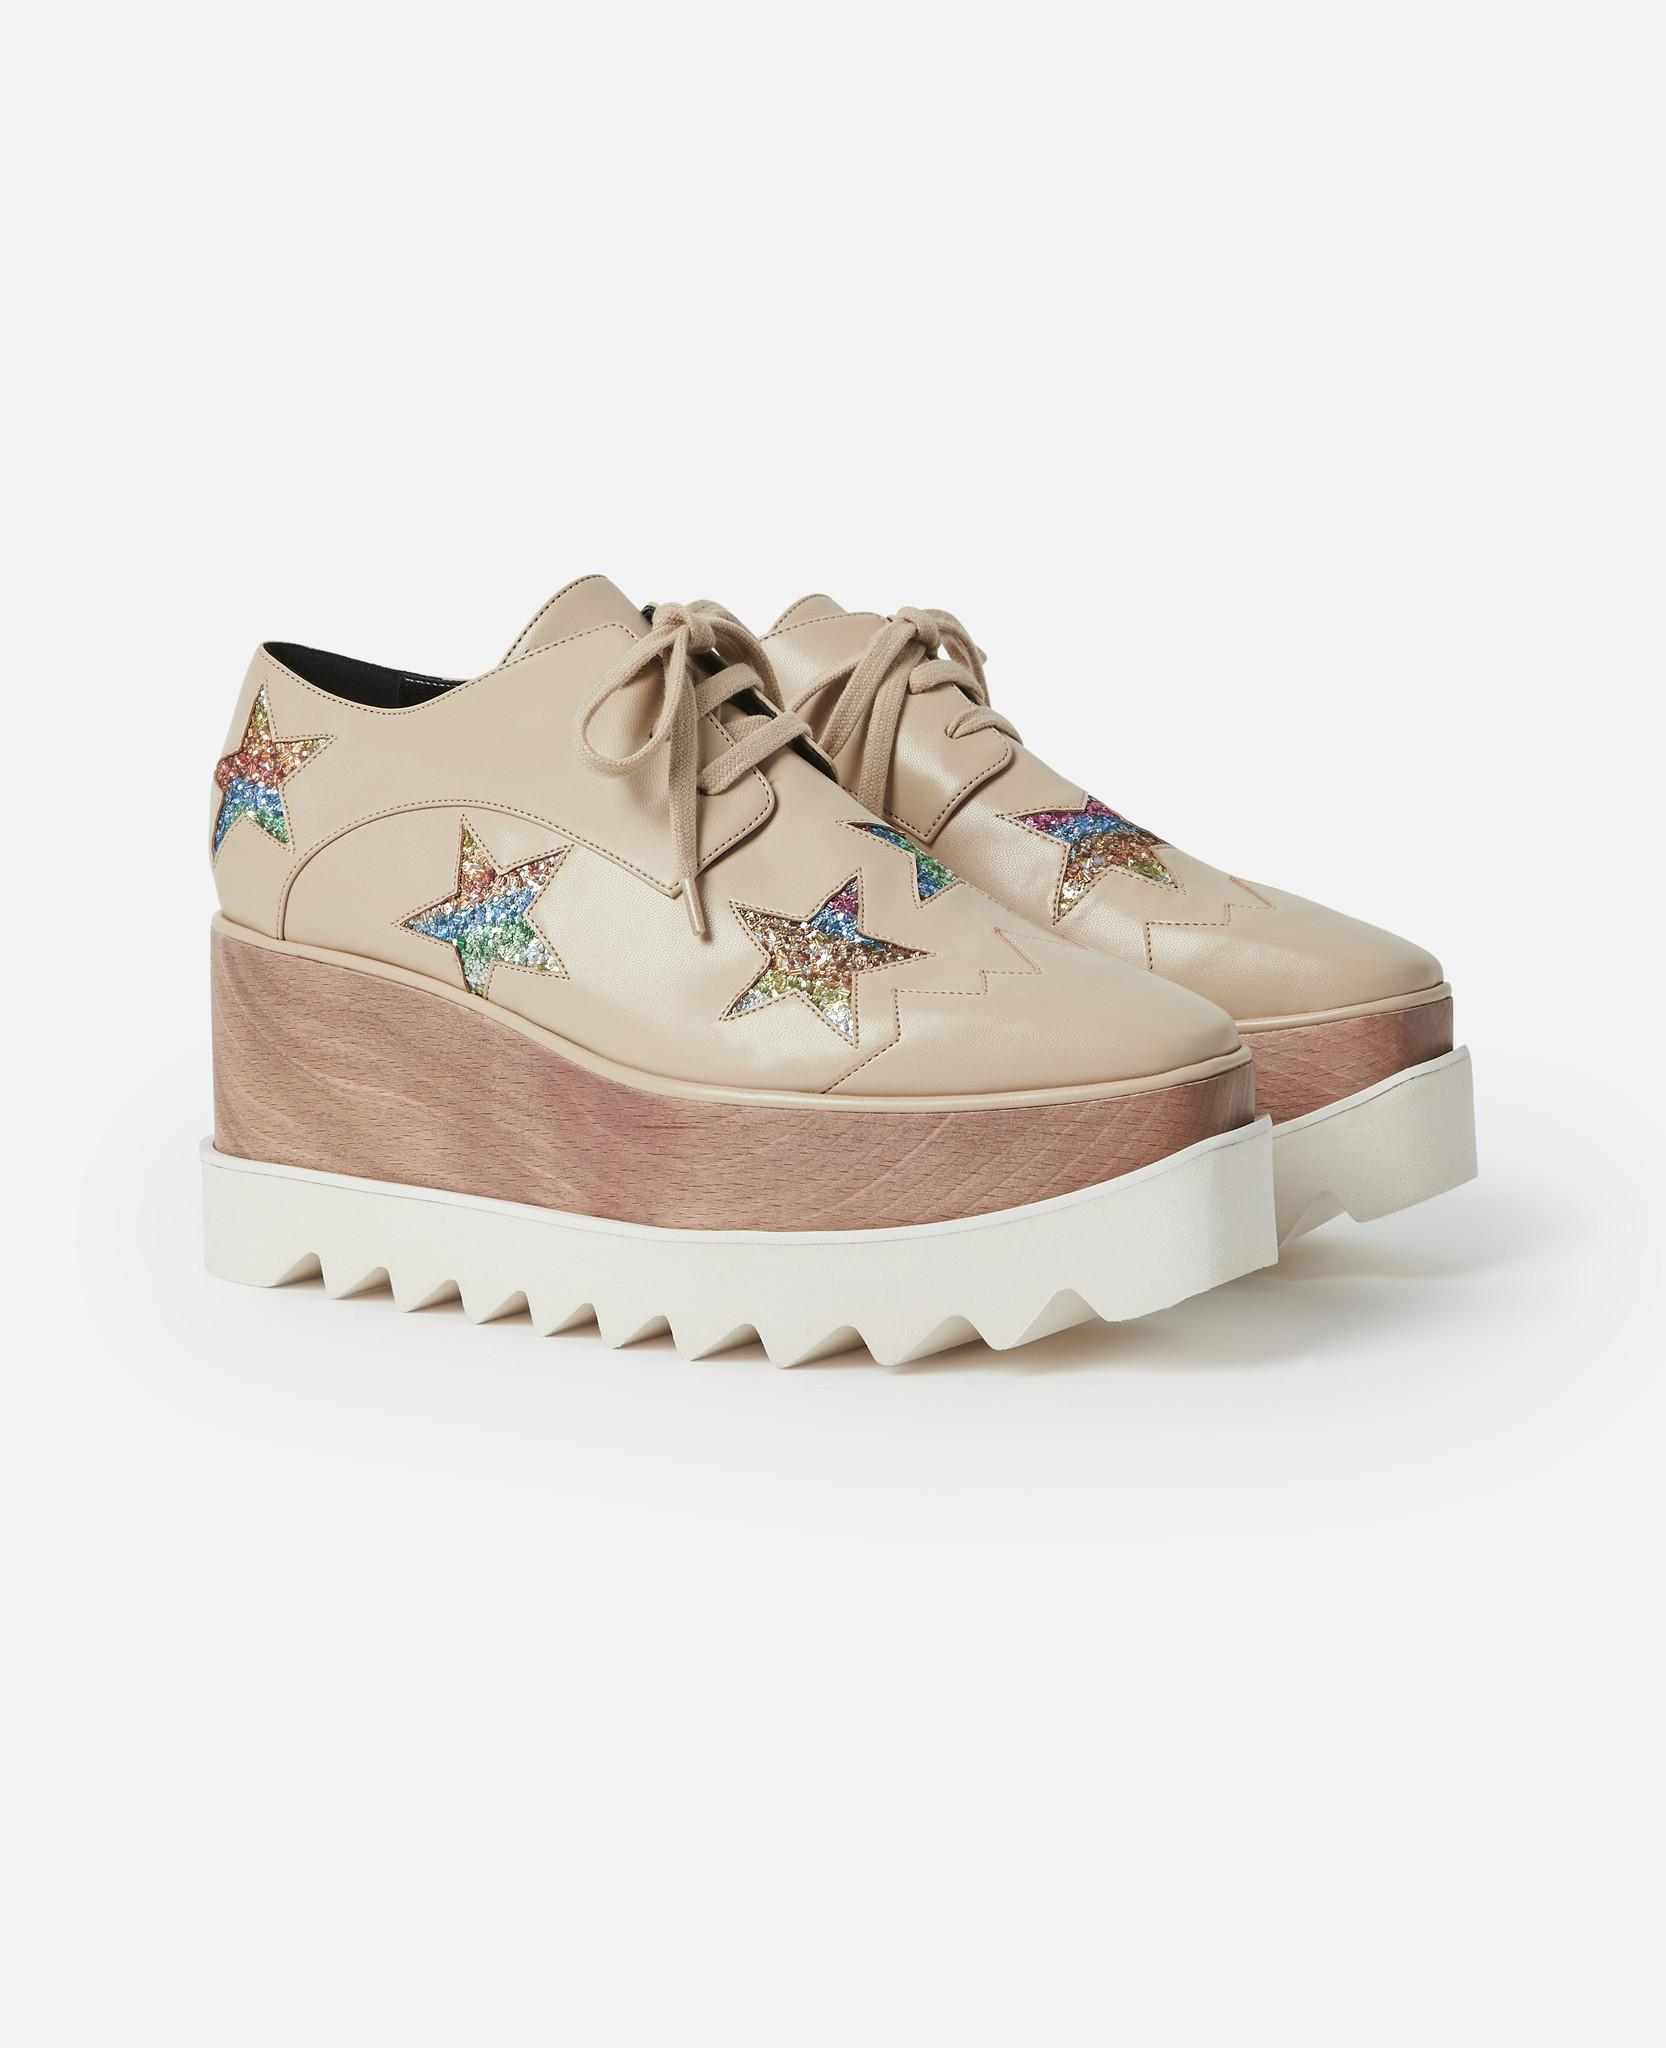 e465c7451ffb Lyst - Stella McCartney Elyse Beige Shoes in Natural